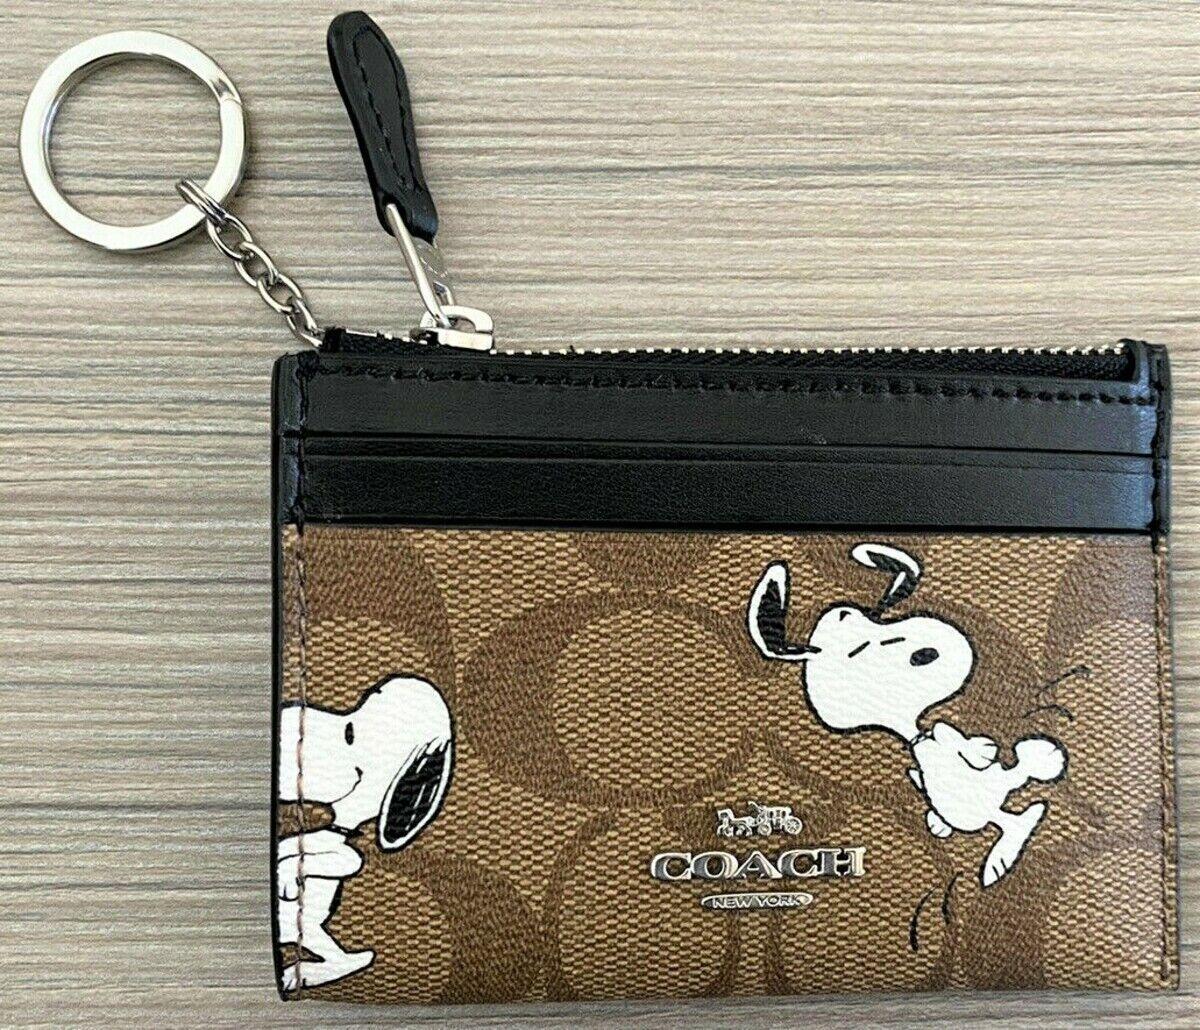 COACH x Peanuts 'Snoopy' Unisex Mini Skinny ID Case Signature Canvas Leather NWT